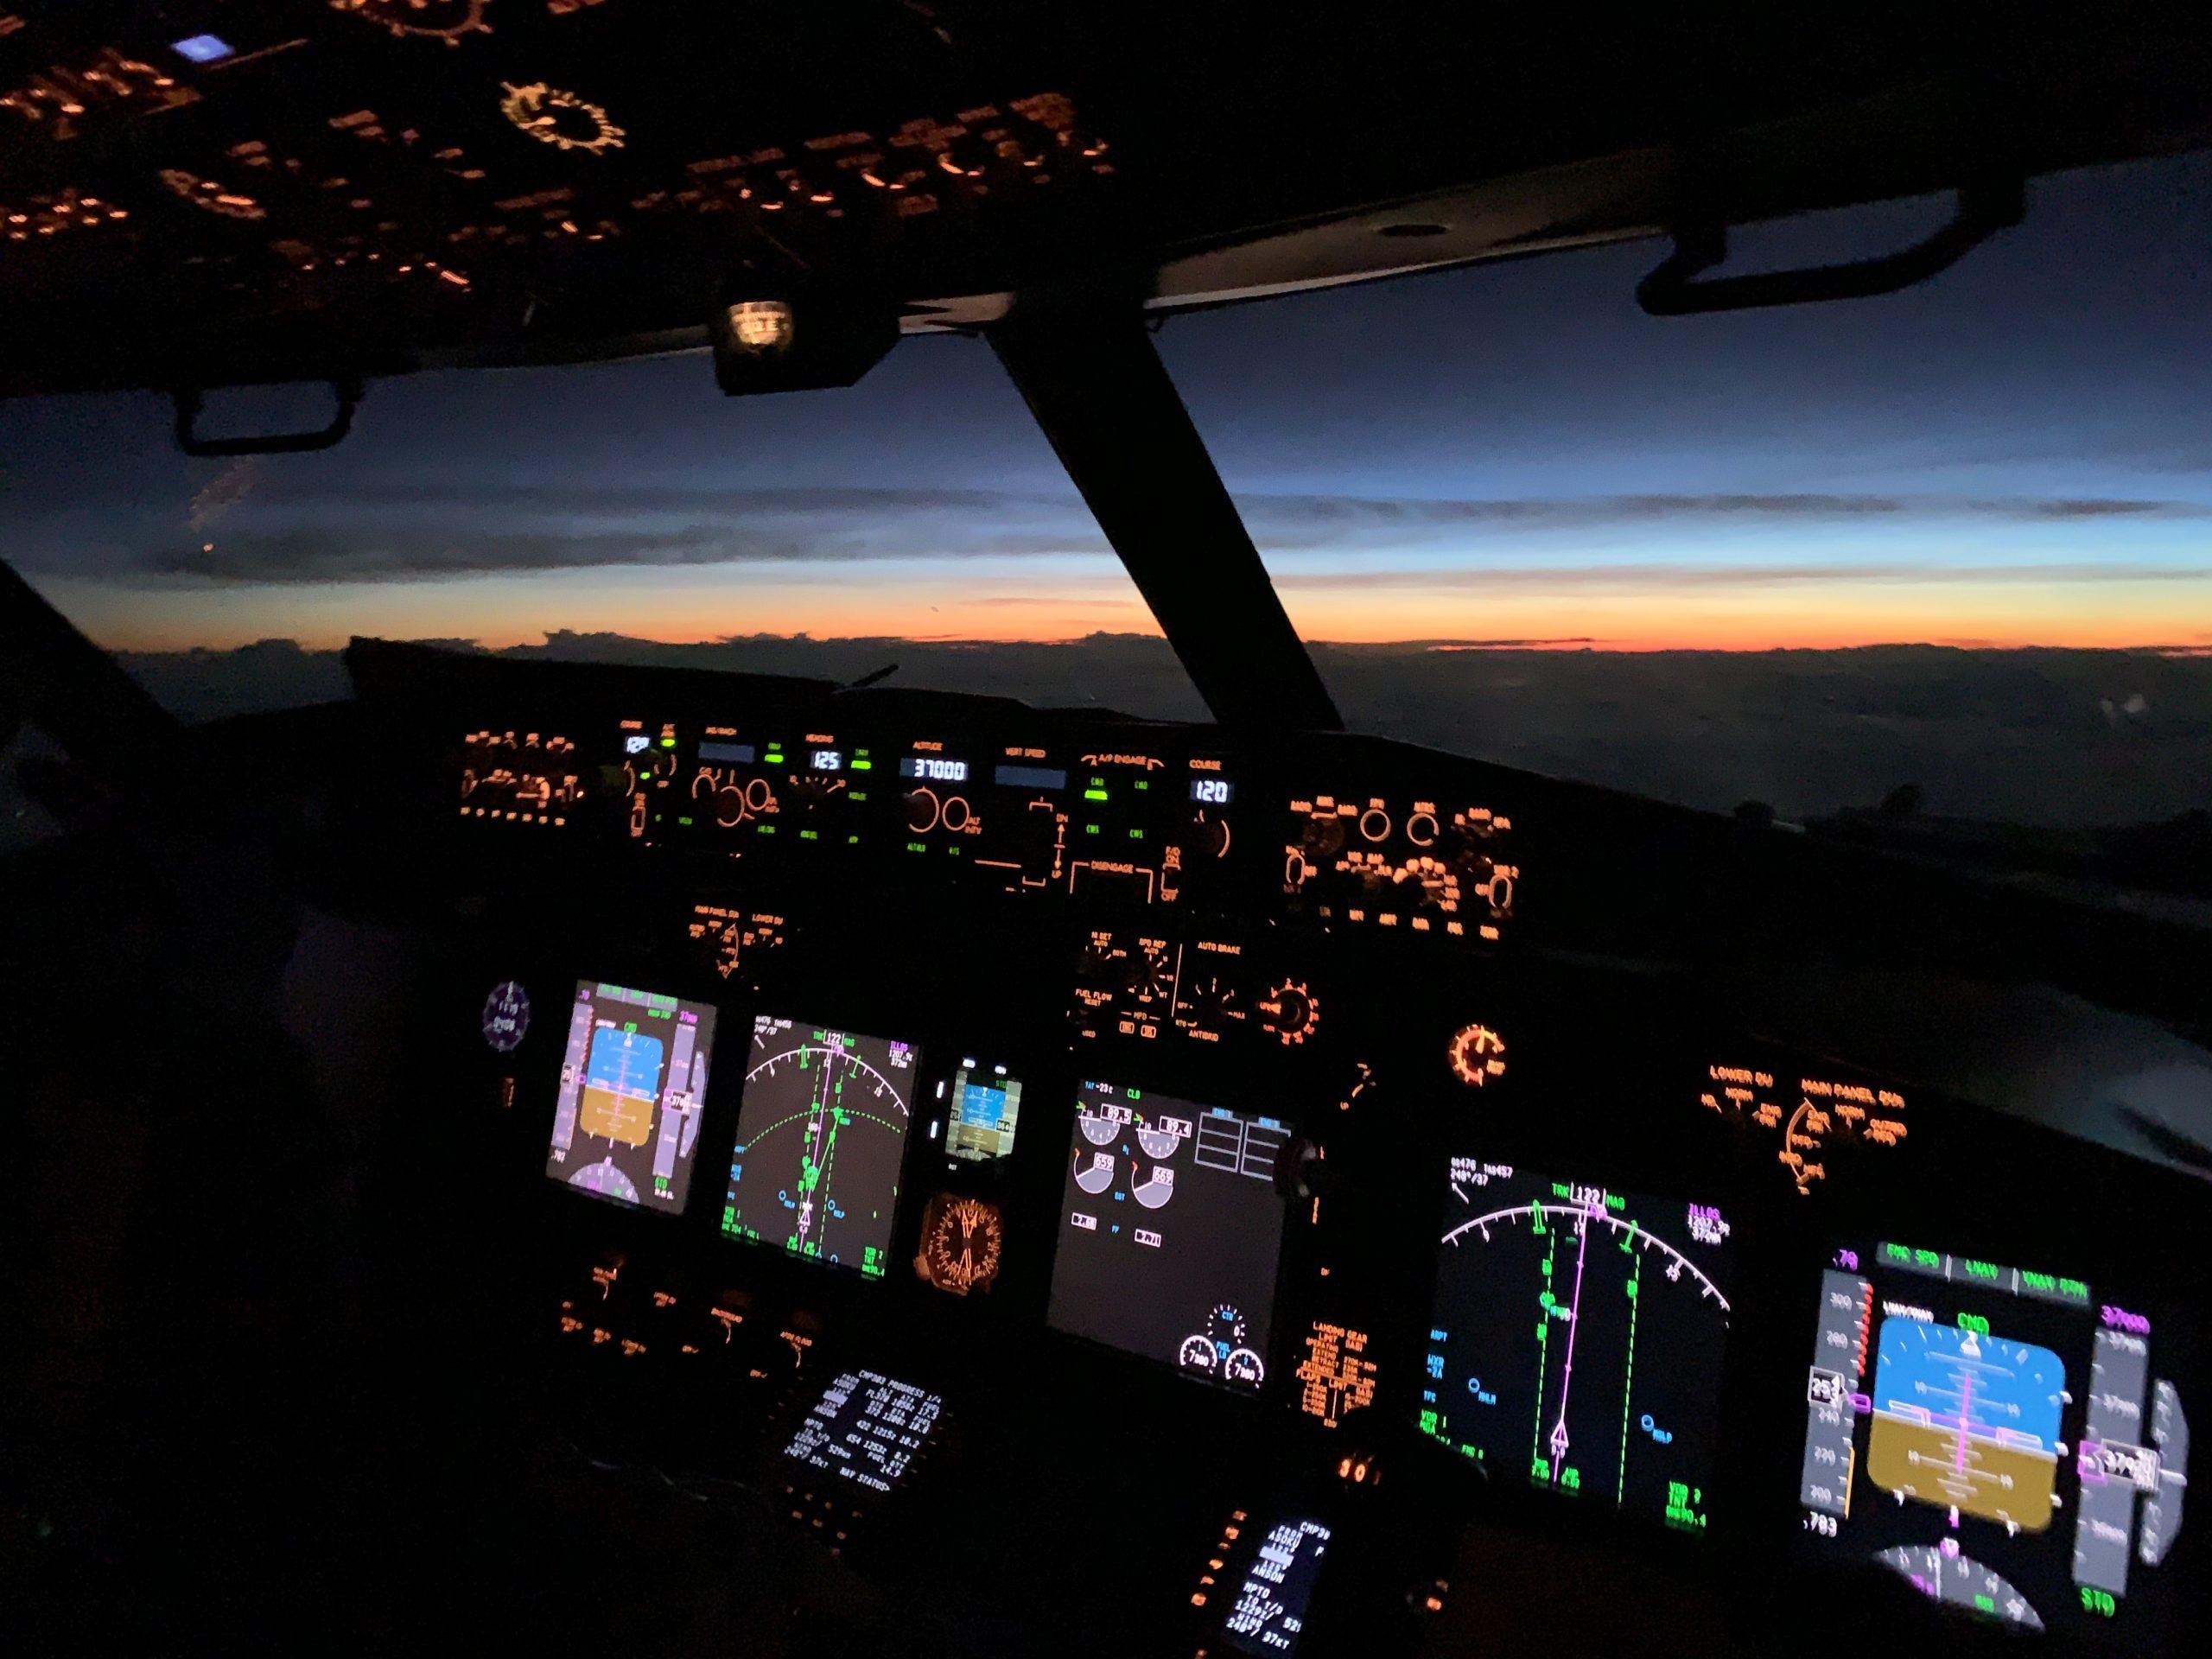 pilot control station